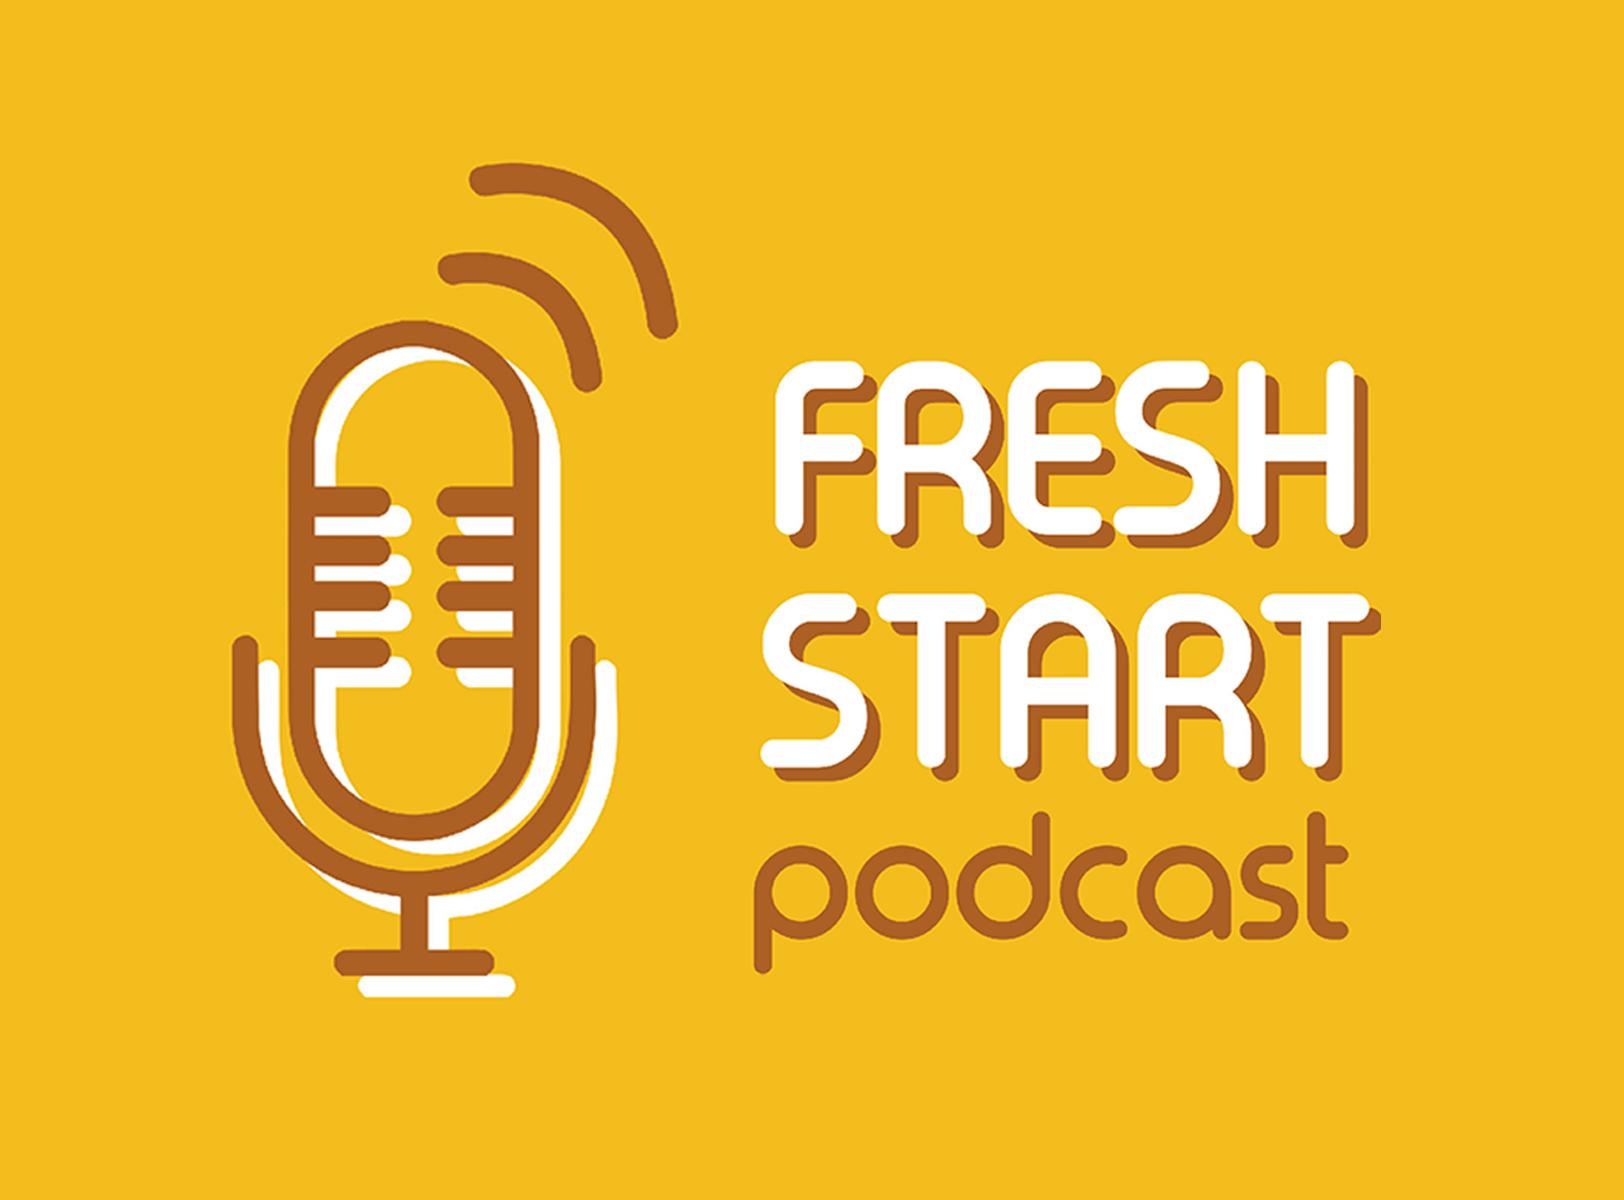 Fresh Start: Podcast News (1/21/2019 Mon.)